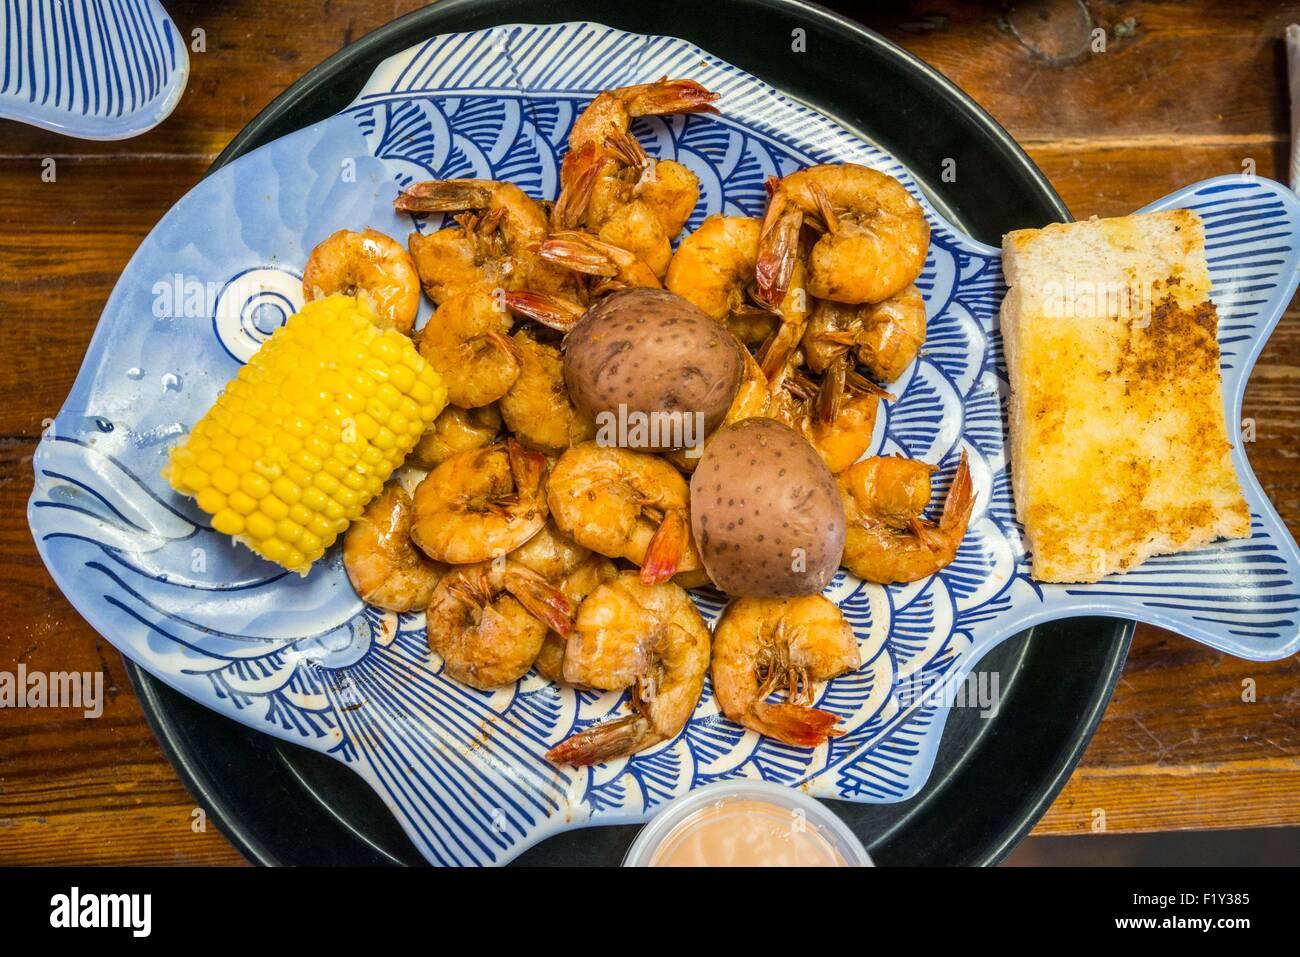 United States, Louisiana, Breaux Bridge, Crazy Bout Crawfish restaurant specializes in crayfish, crabs and shrimp - Stock Image